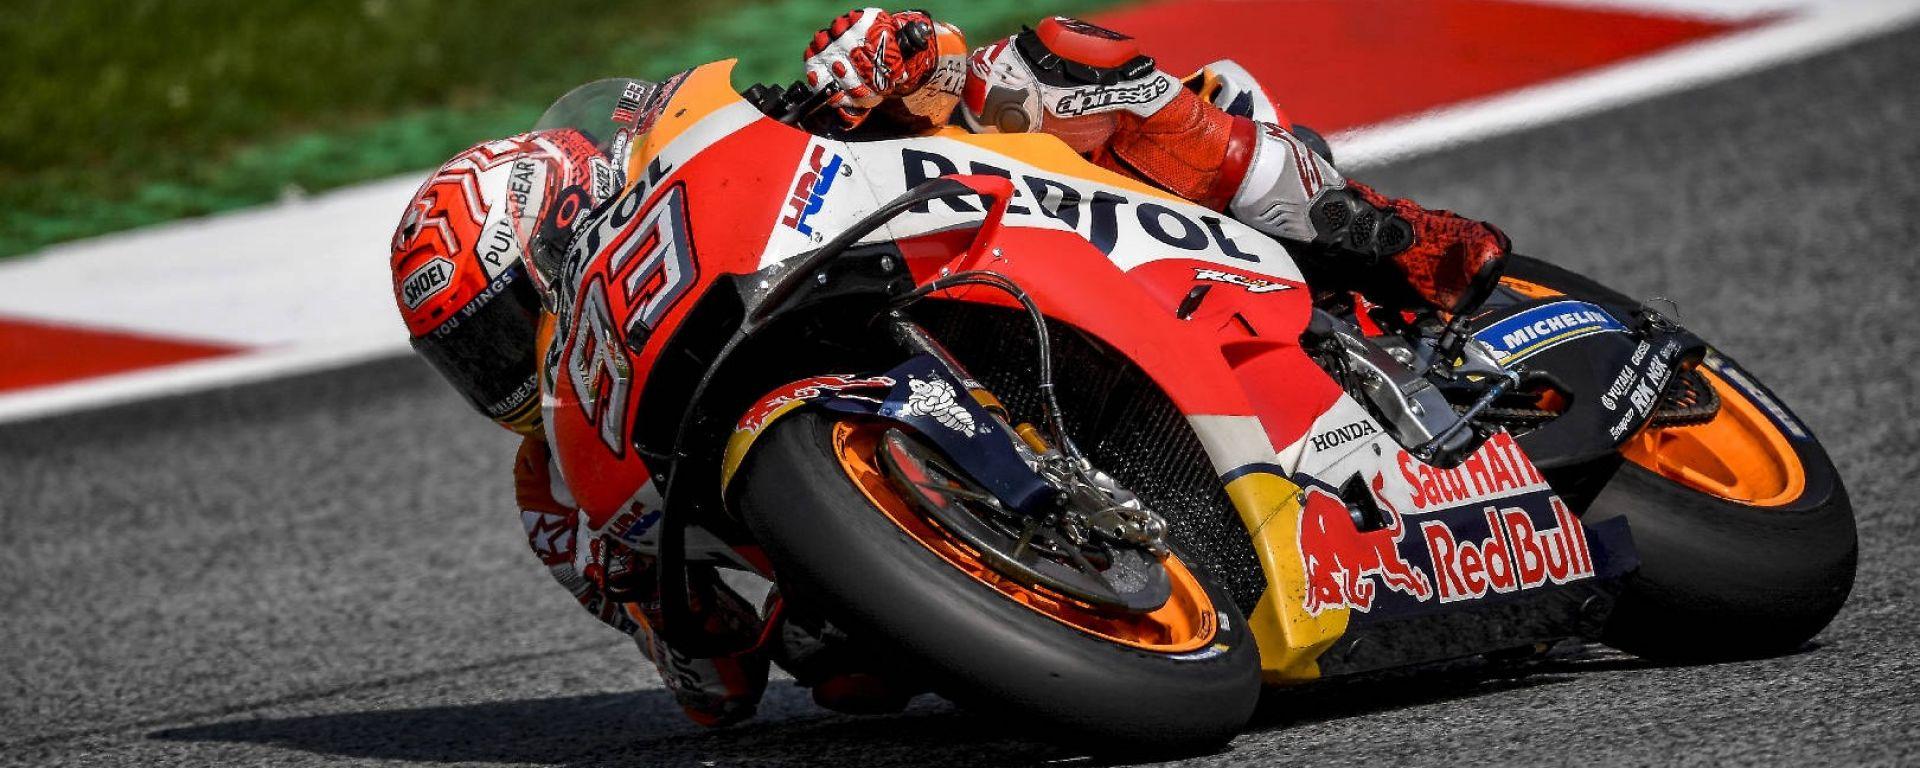 MotoGP Austria 2018: Marquez in pole, Rossi in grande difficoltà